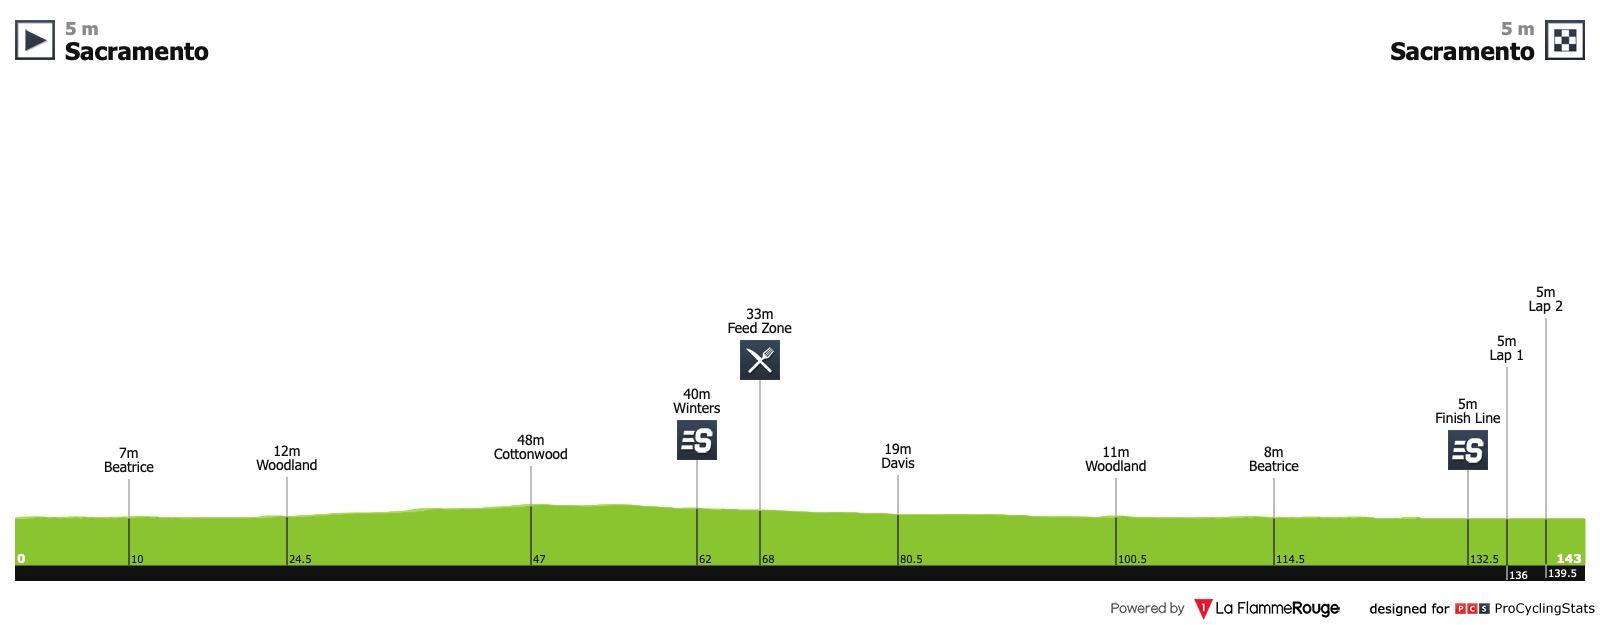 Amgen Tour of California 2019 Tour-of-california-2019-stage-1-profile-ba006000a7